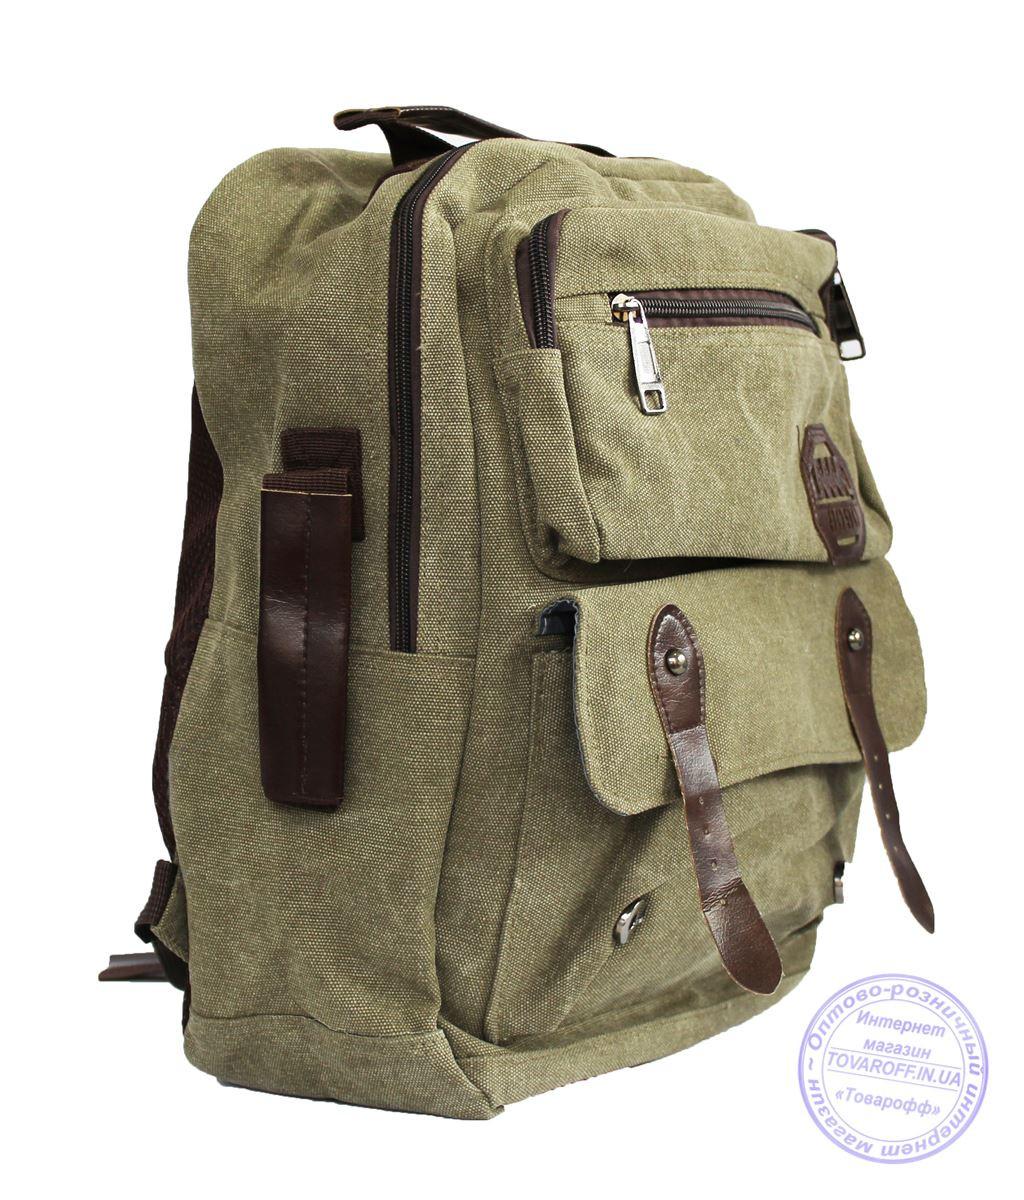 Матерчатый рюкзак - зеленый - 7121